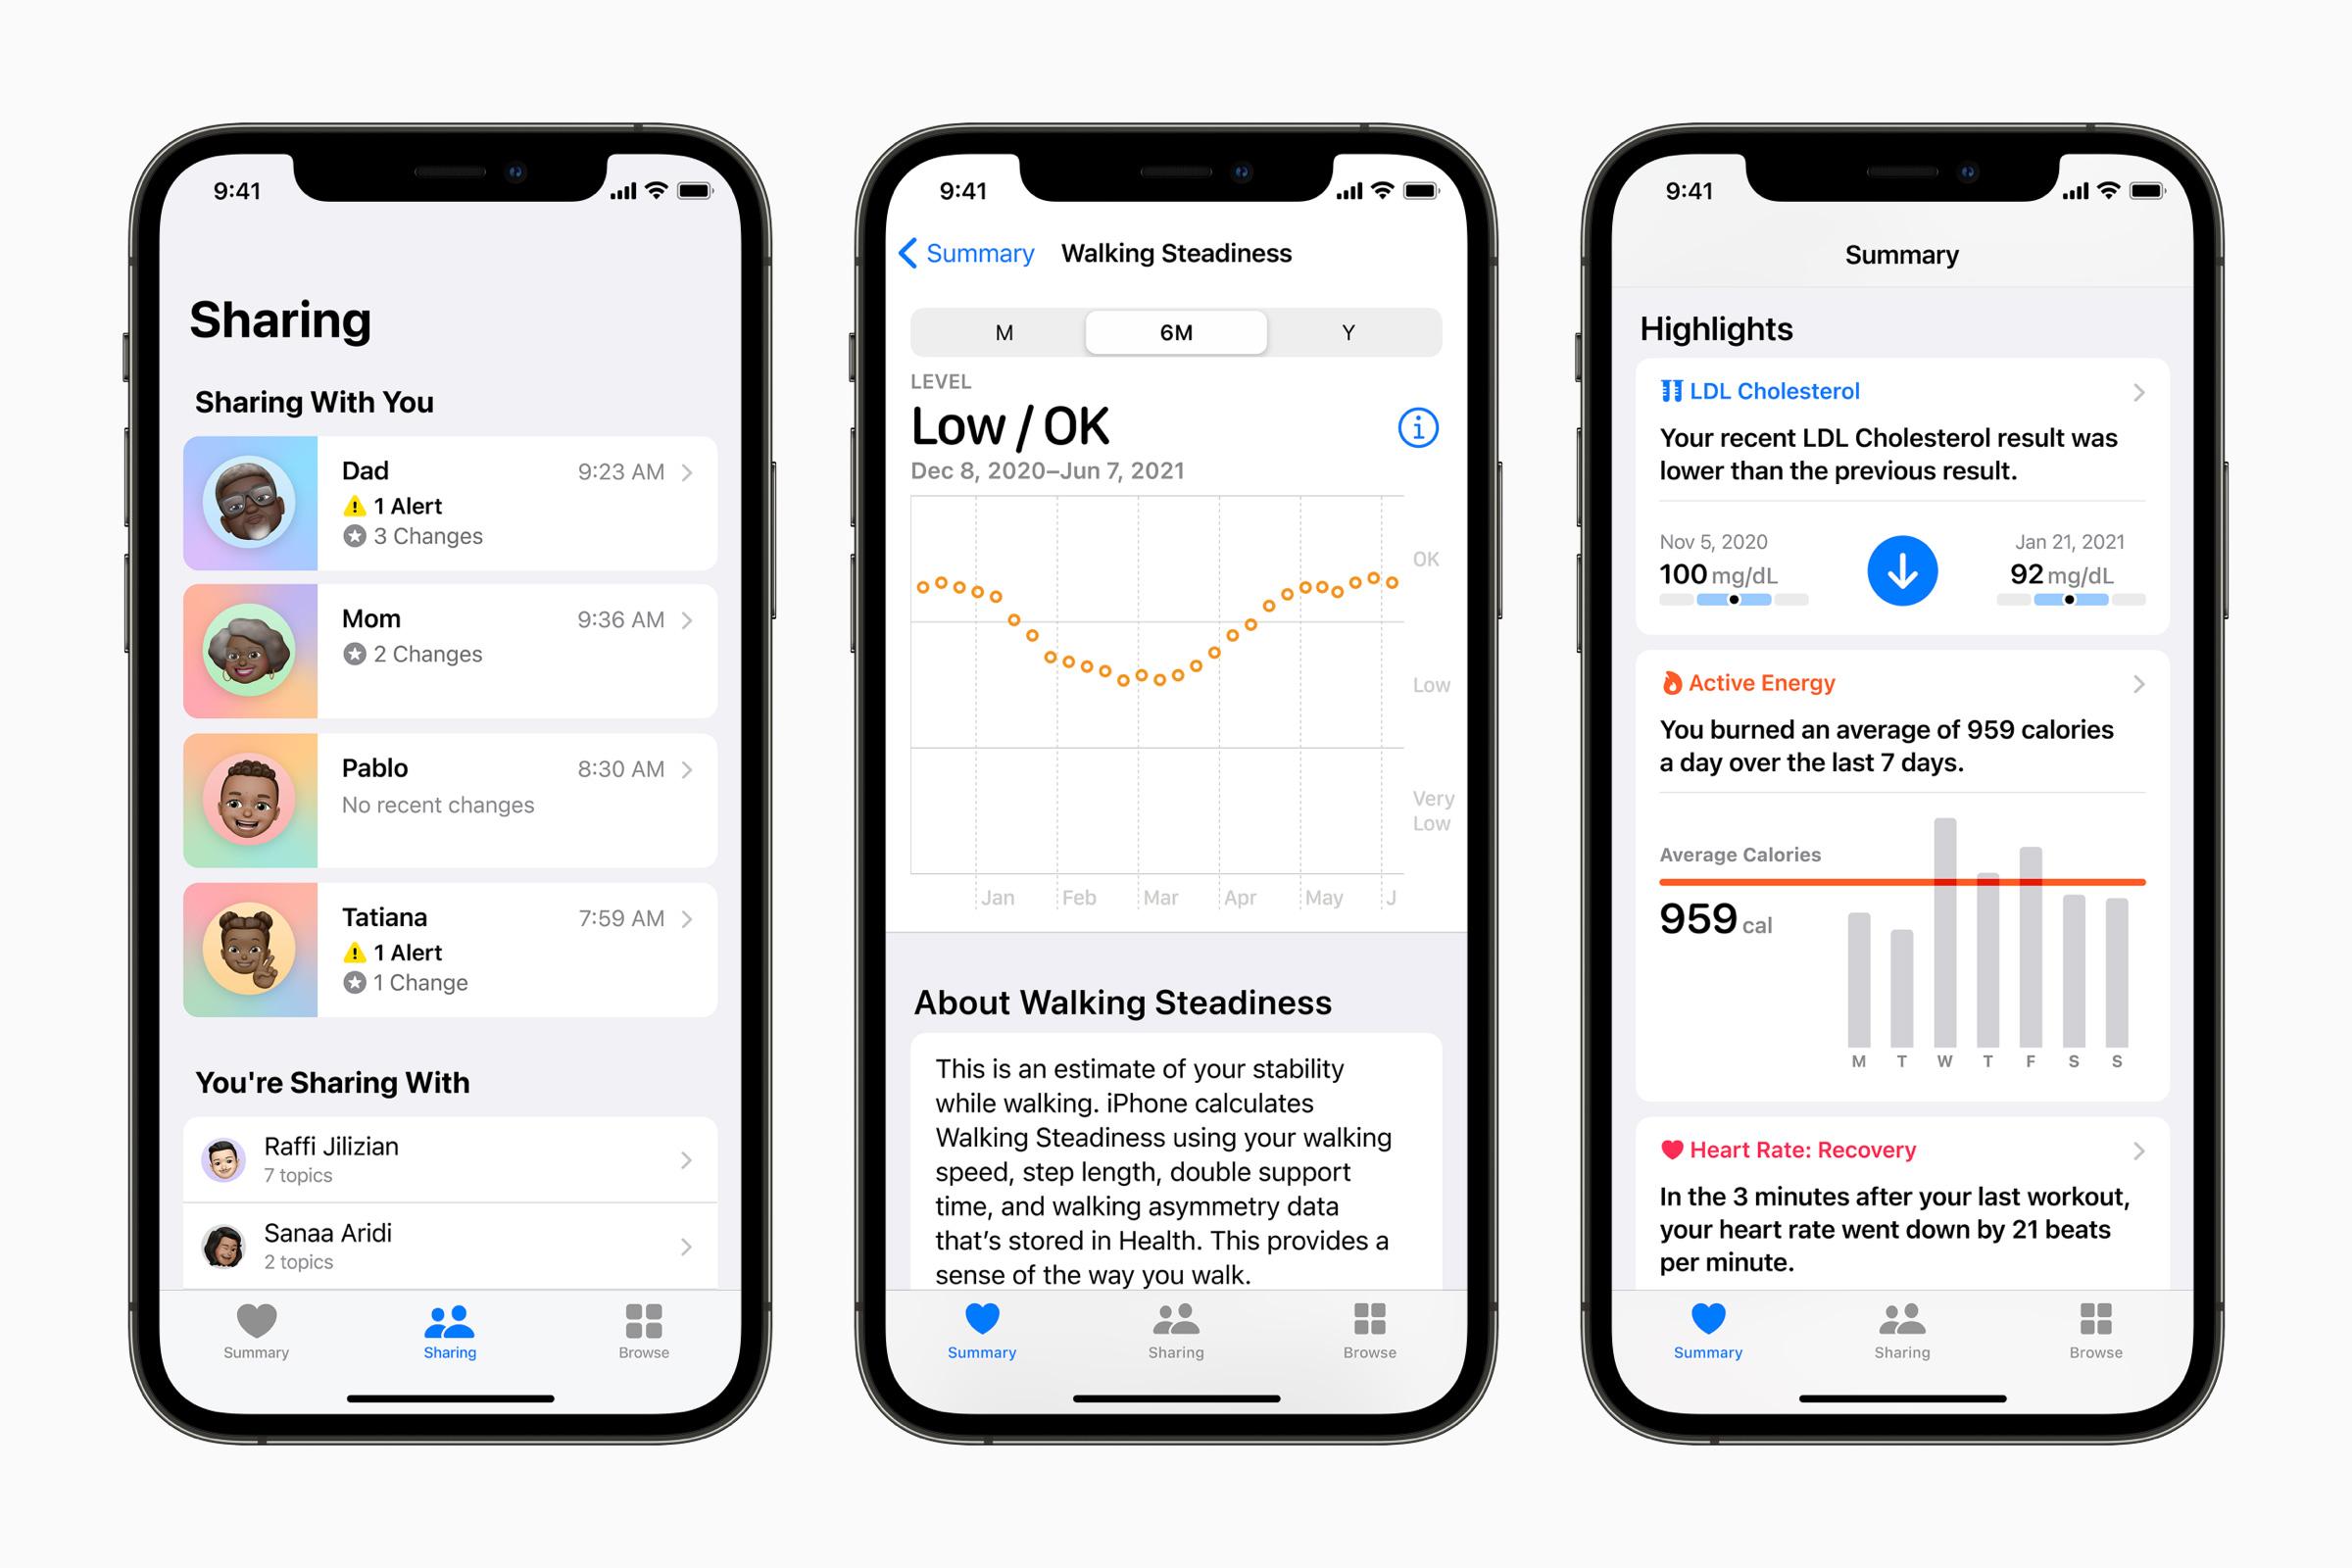 Apple's Health app in iOS 15.